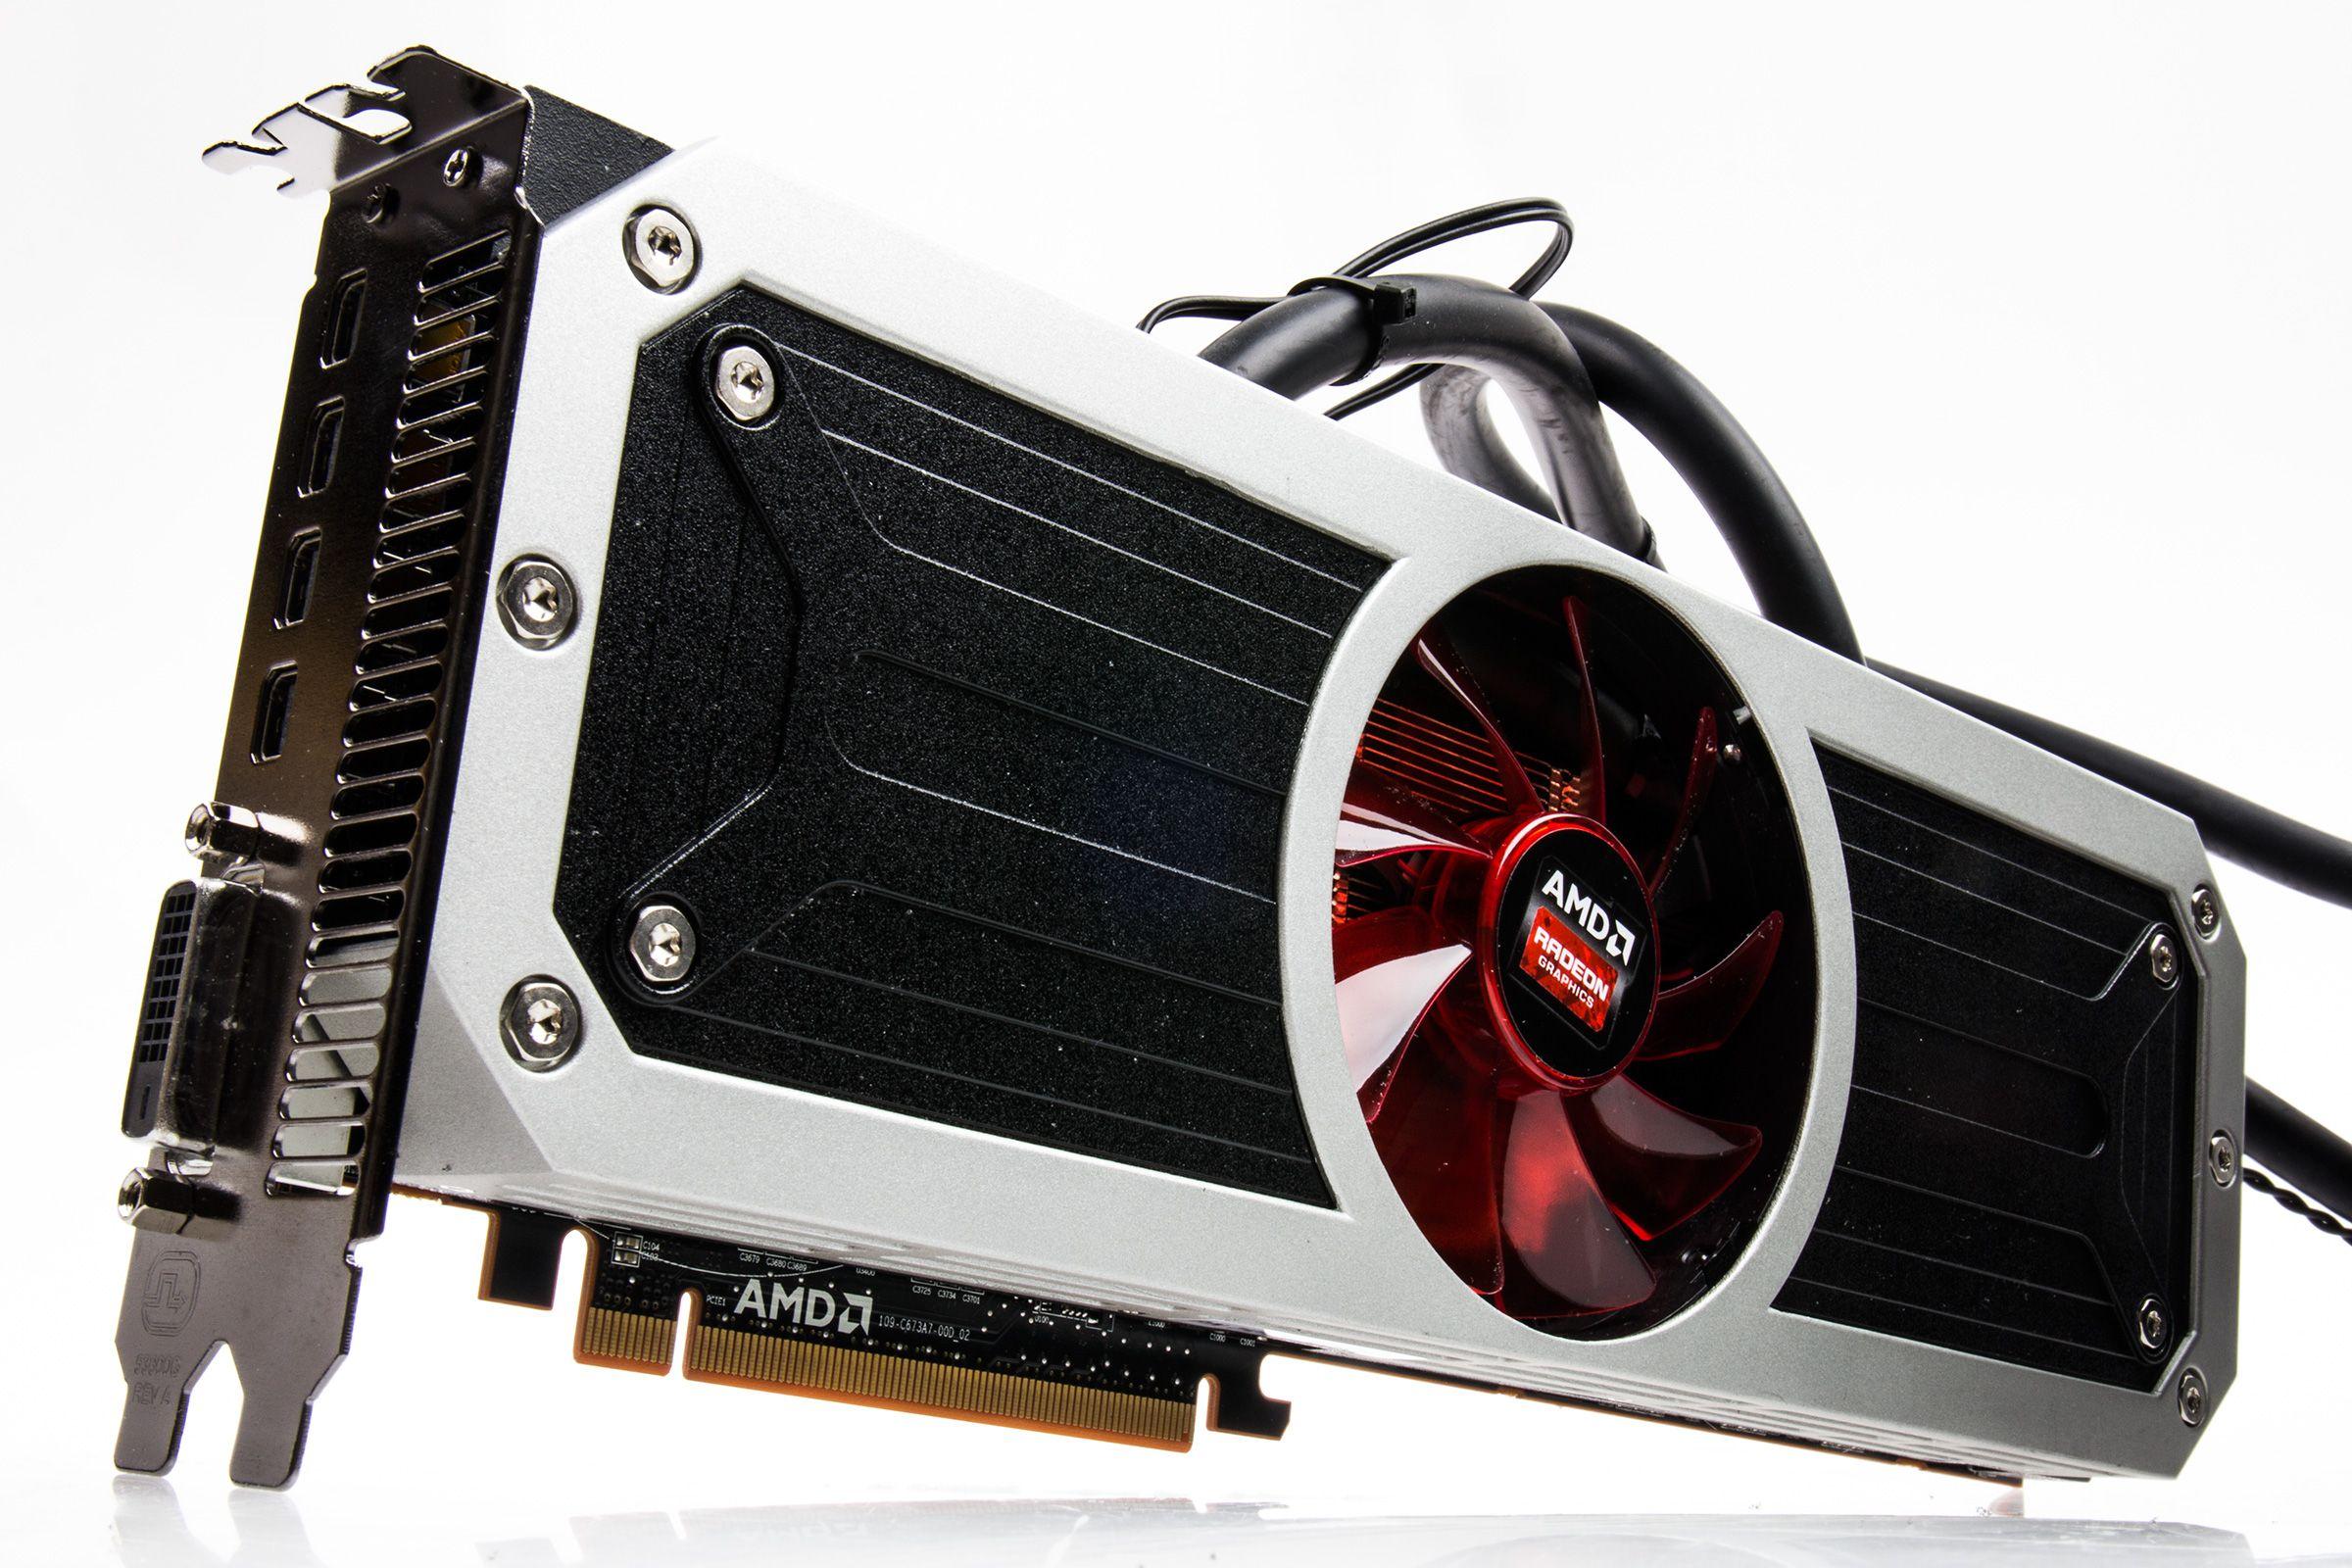 AMD Radeon R9 295X2.Foto: Varg Aamo, Hardware.no